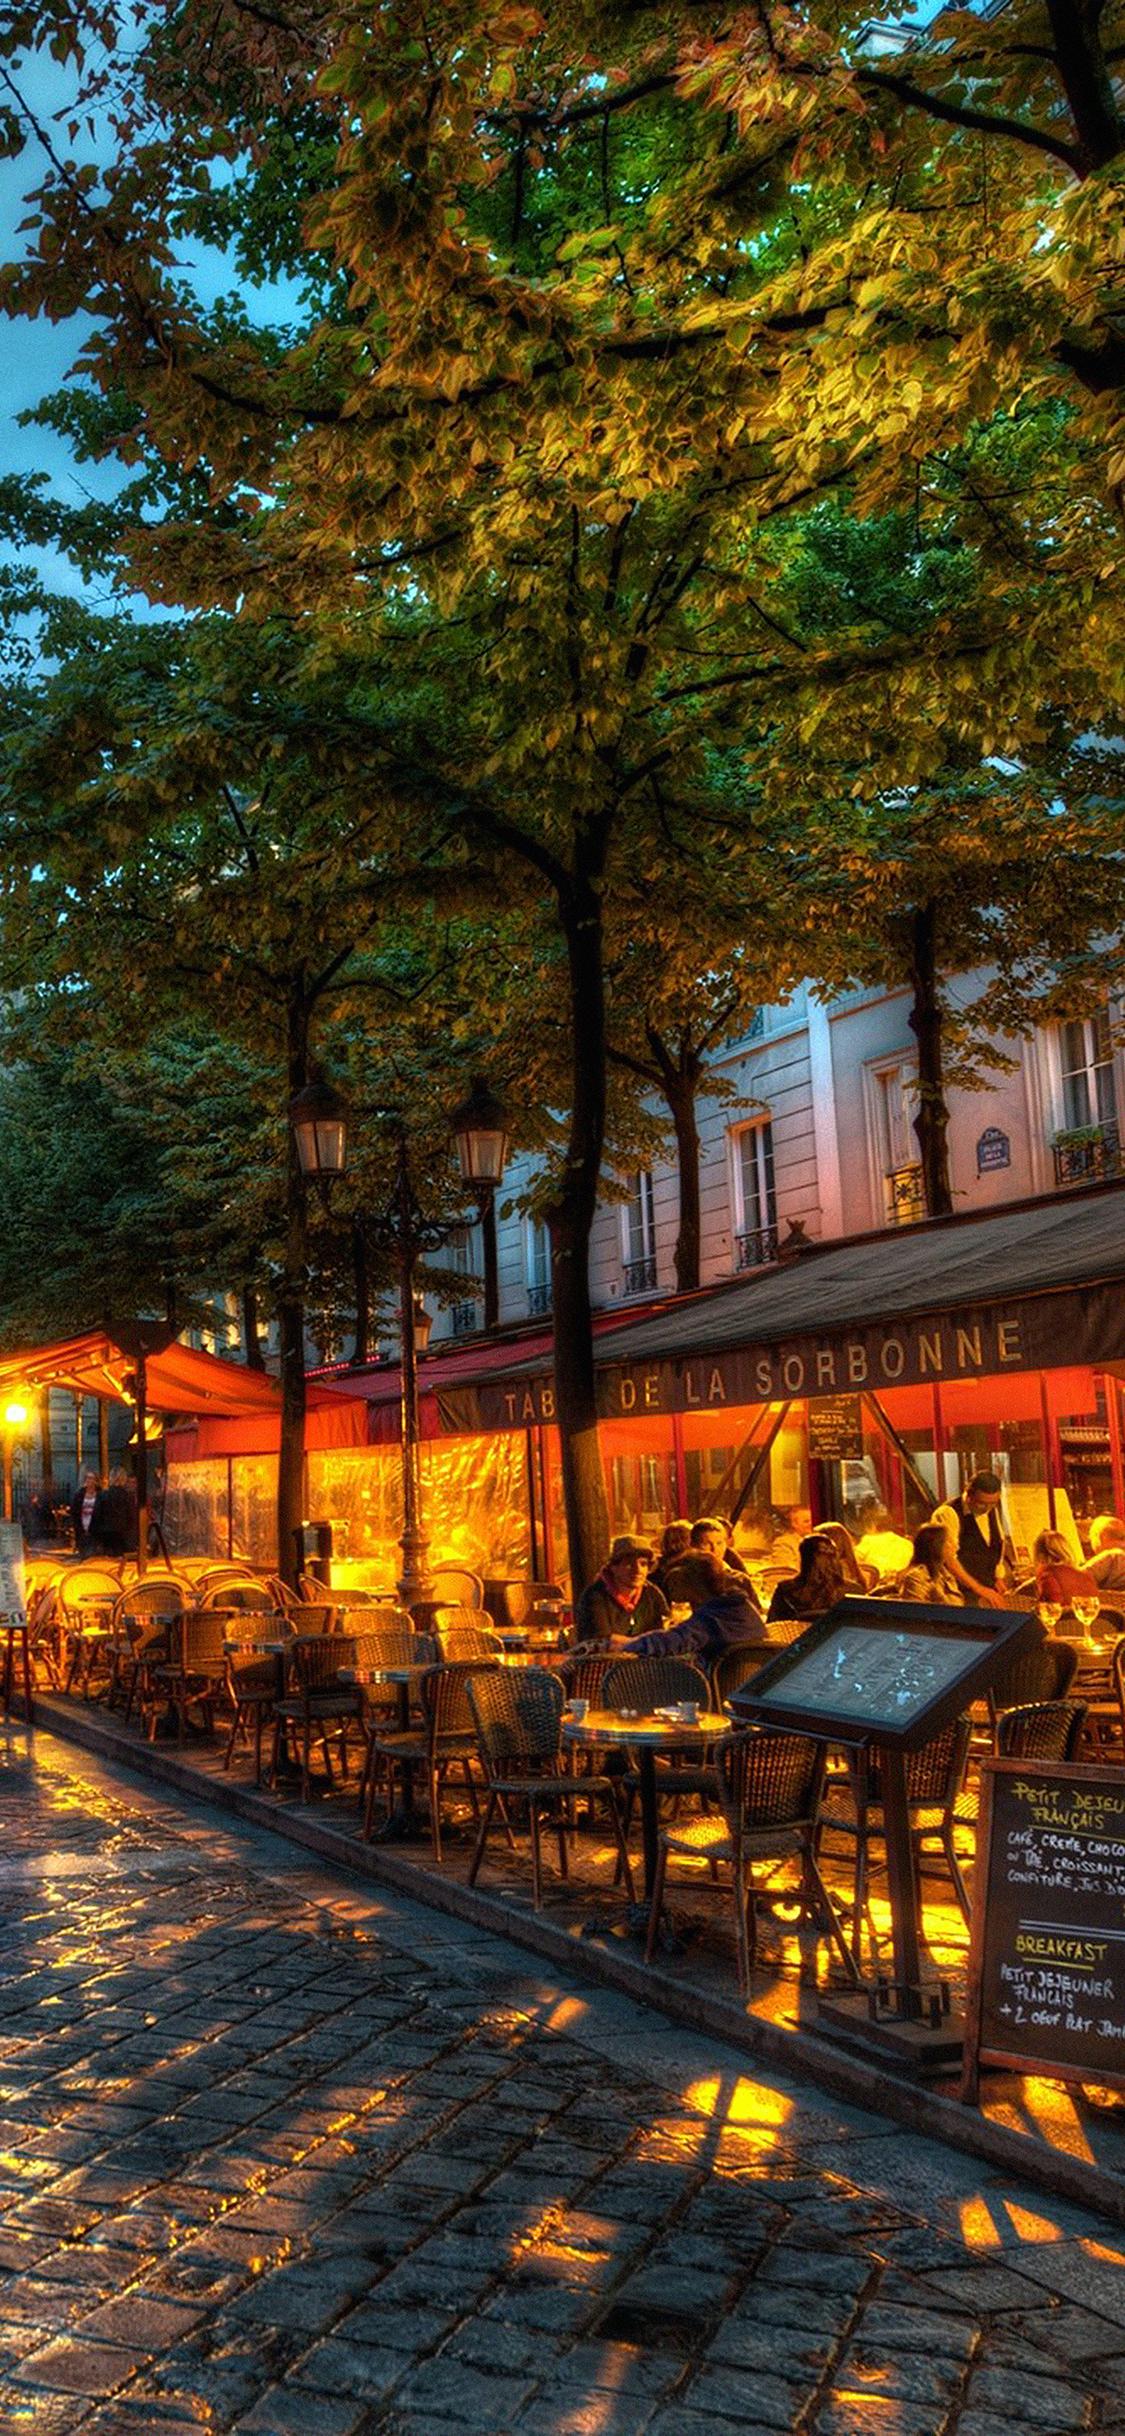 iPhoneXpapers.com-Apple-iPhone-wallpaper-me85-de-la-sorbonne-city-street